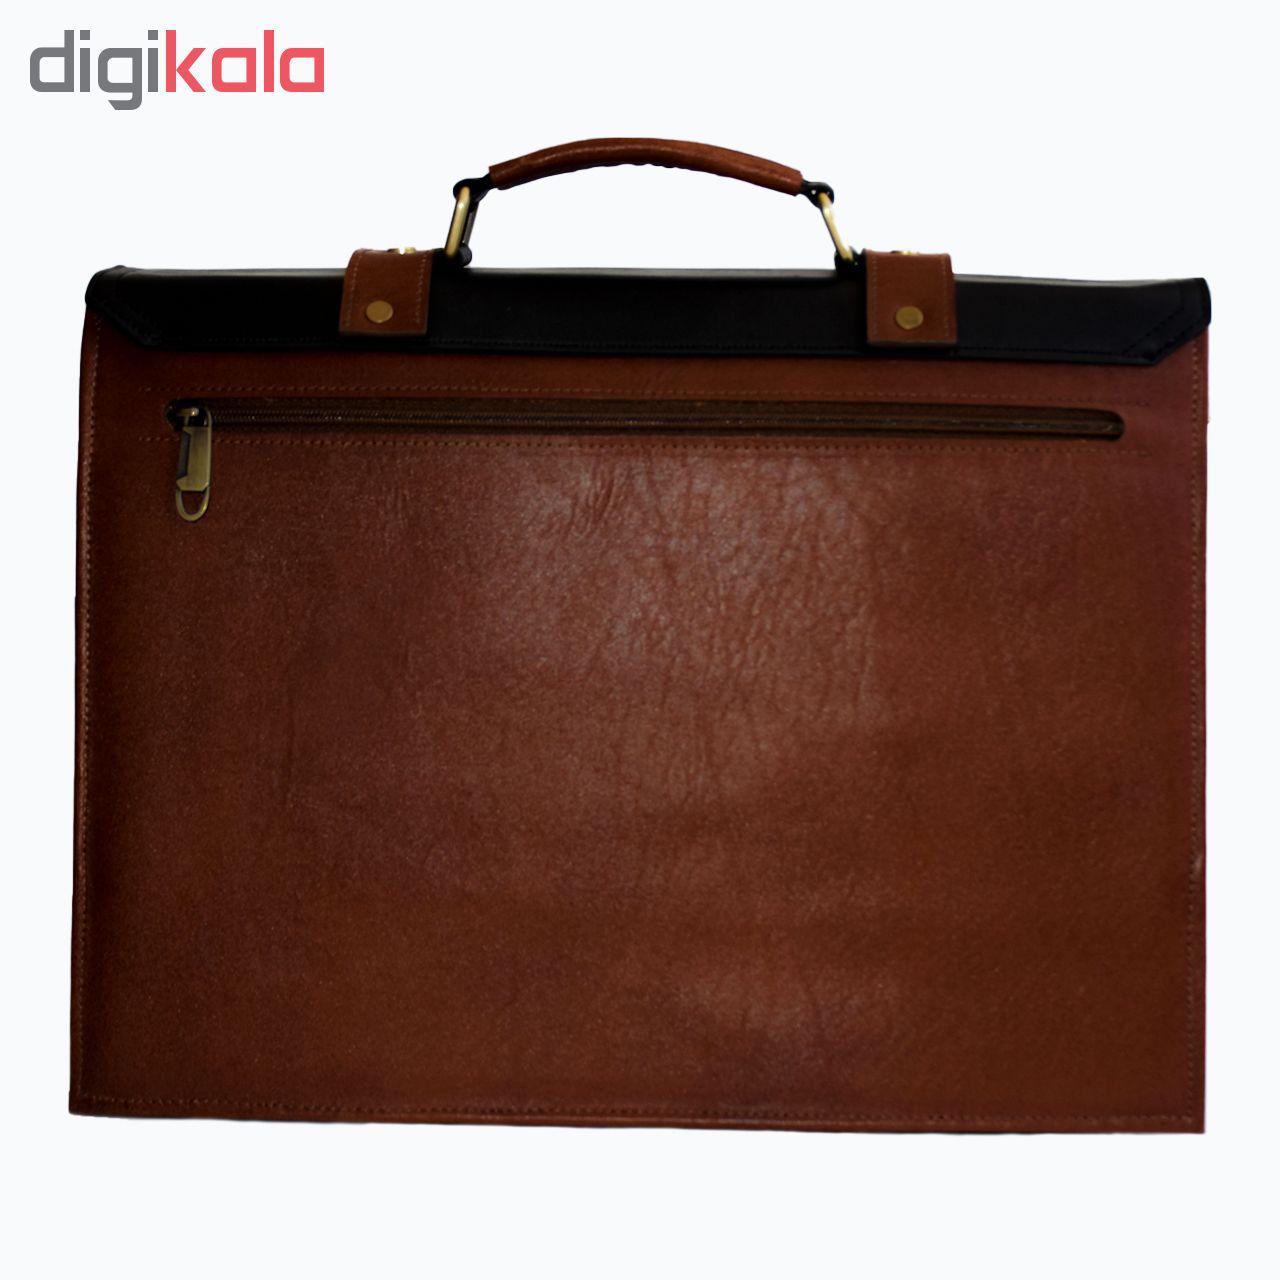 کیف اداری مردانه دیان چرم کد kpd002